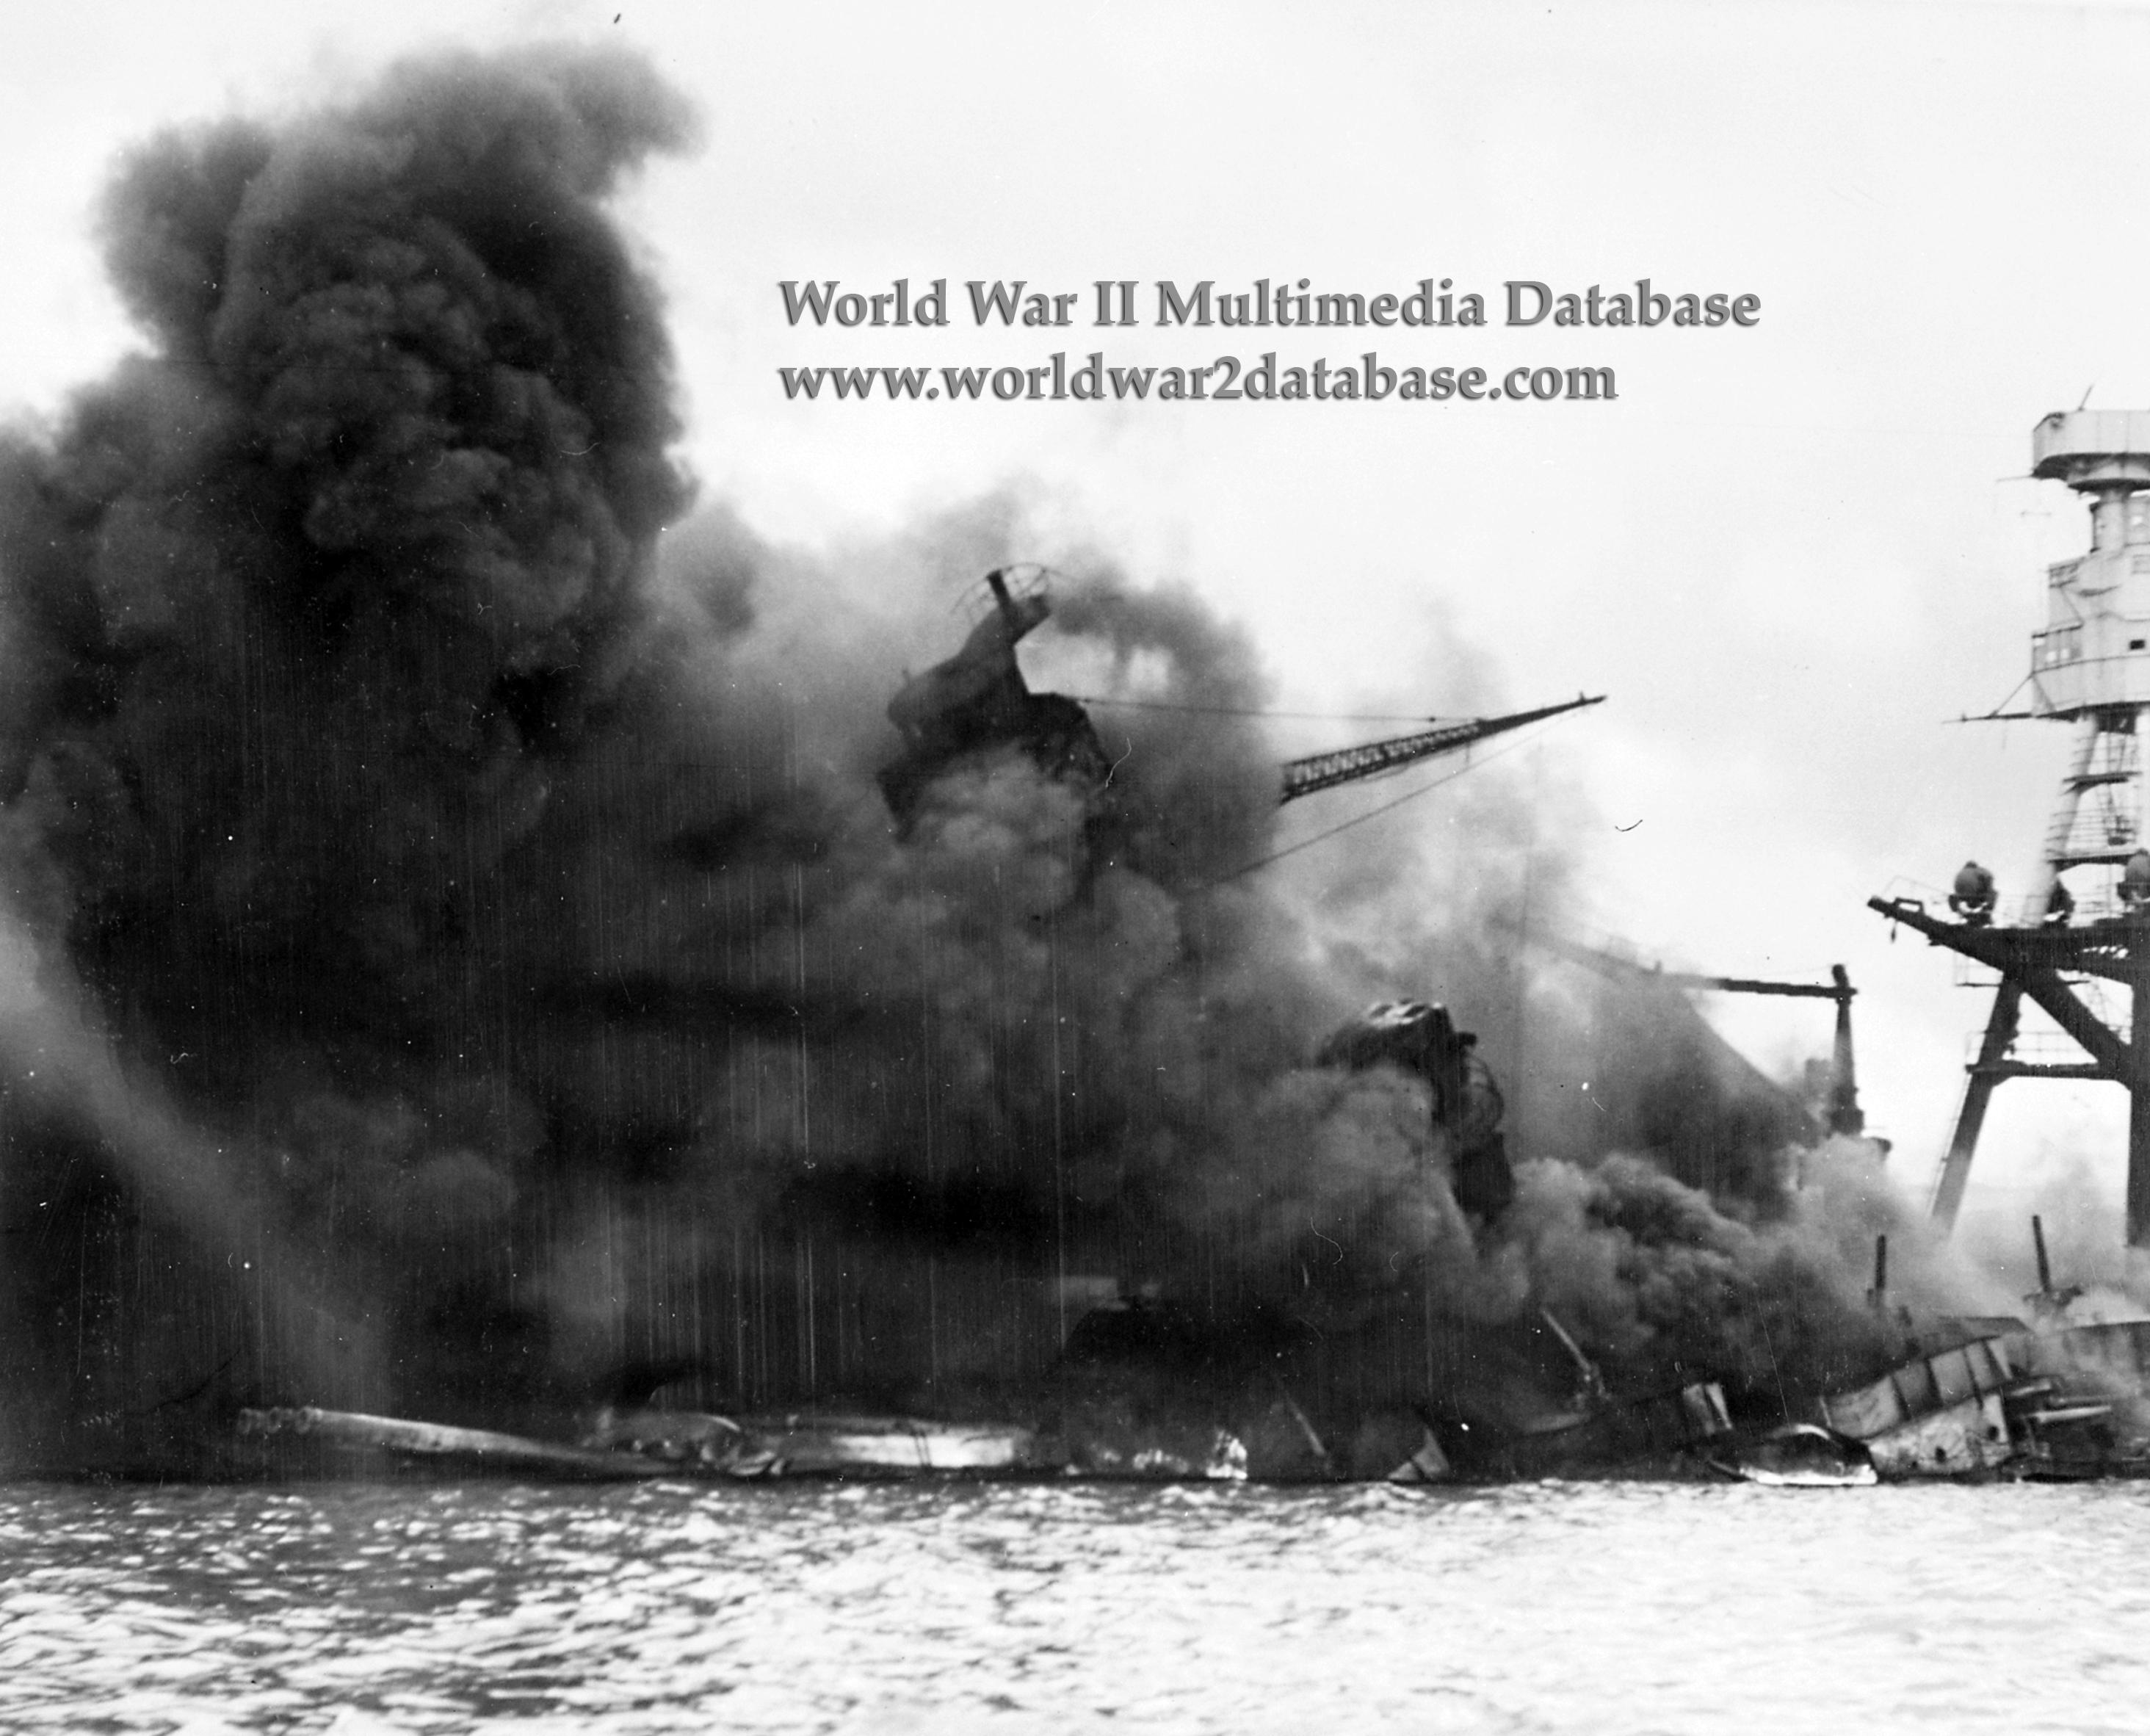 USS Arizona (BB-39) Burns After Japanese Air Attack